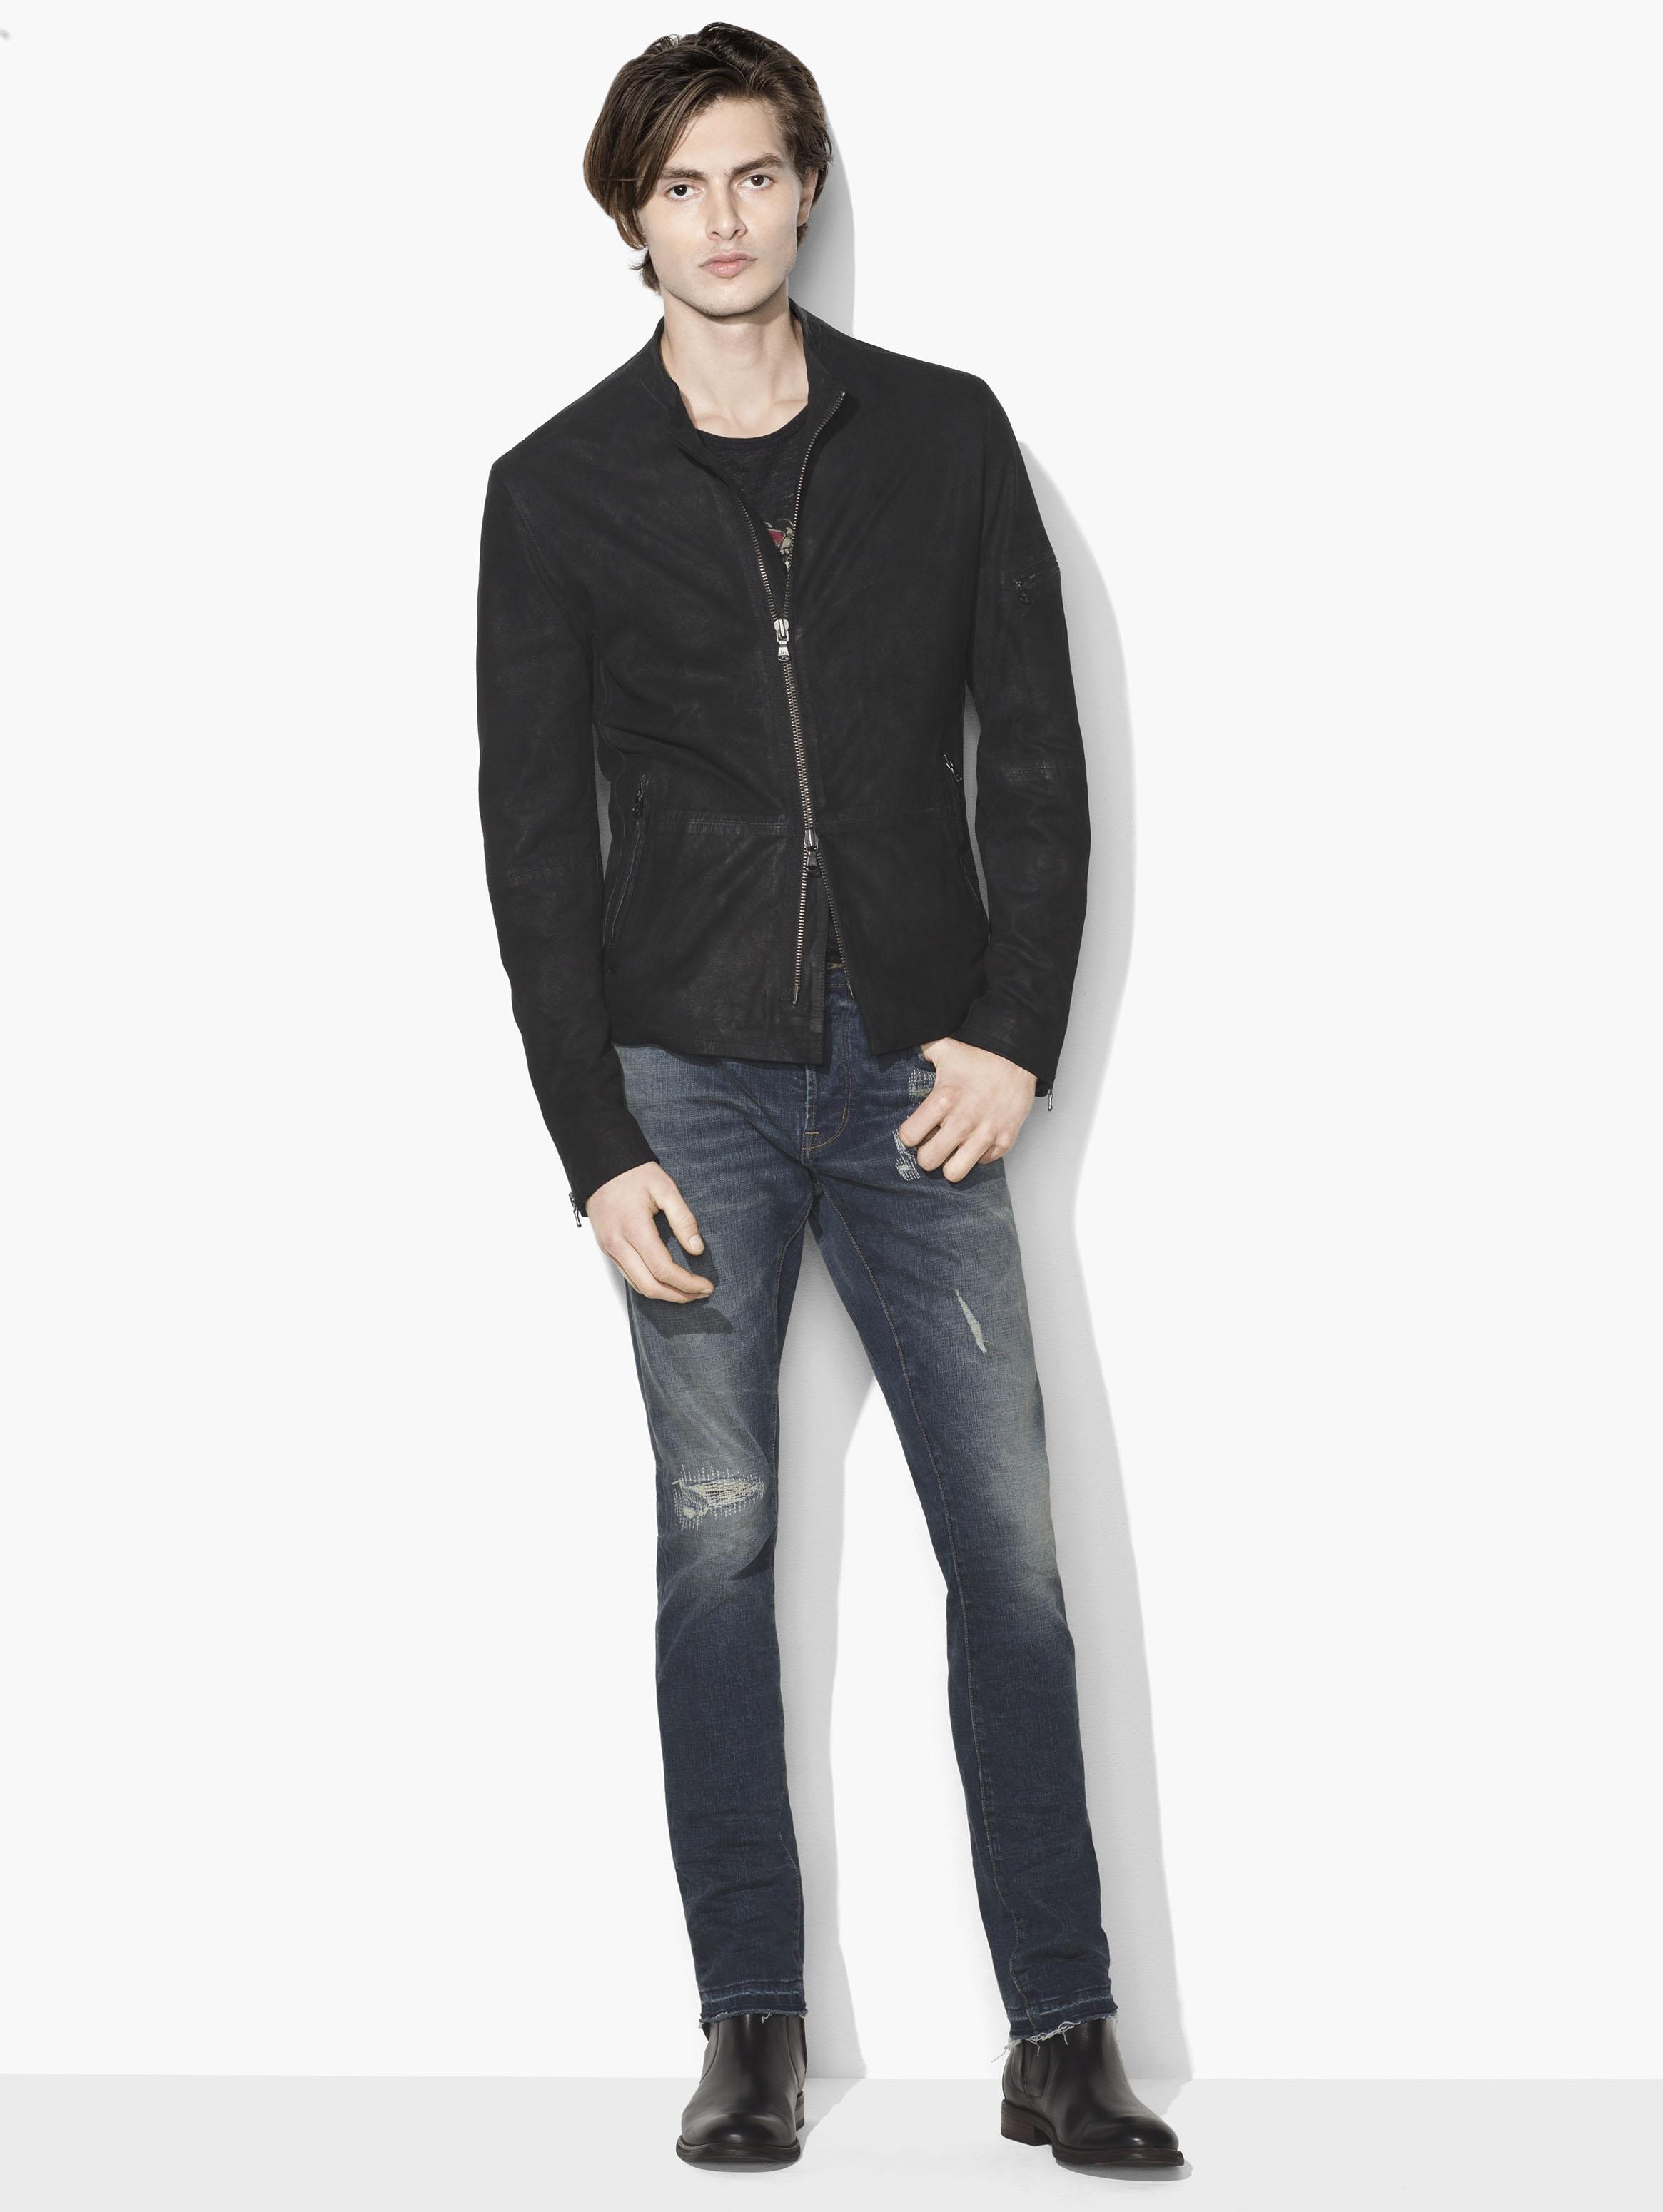 CafÉ Racer Leather Jacket by John Varvatos